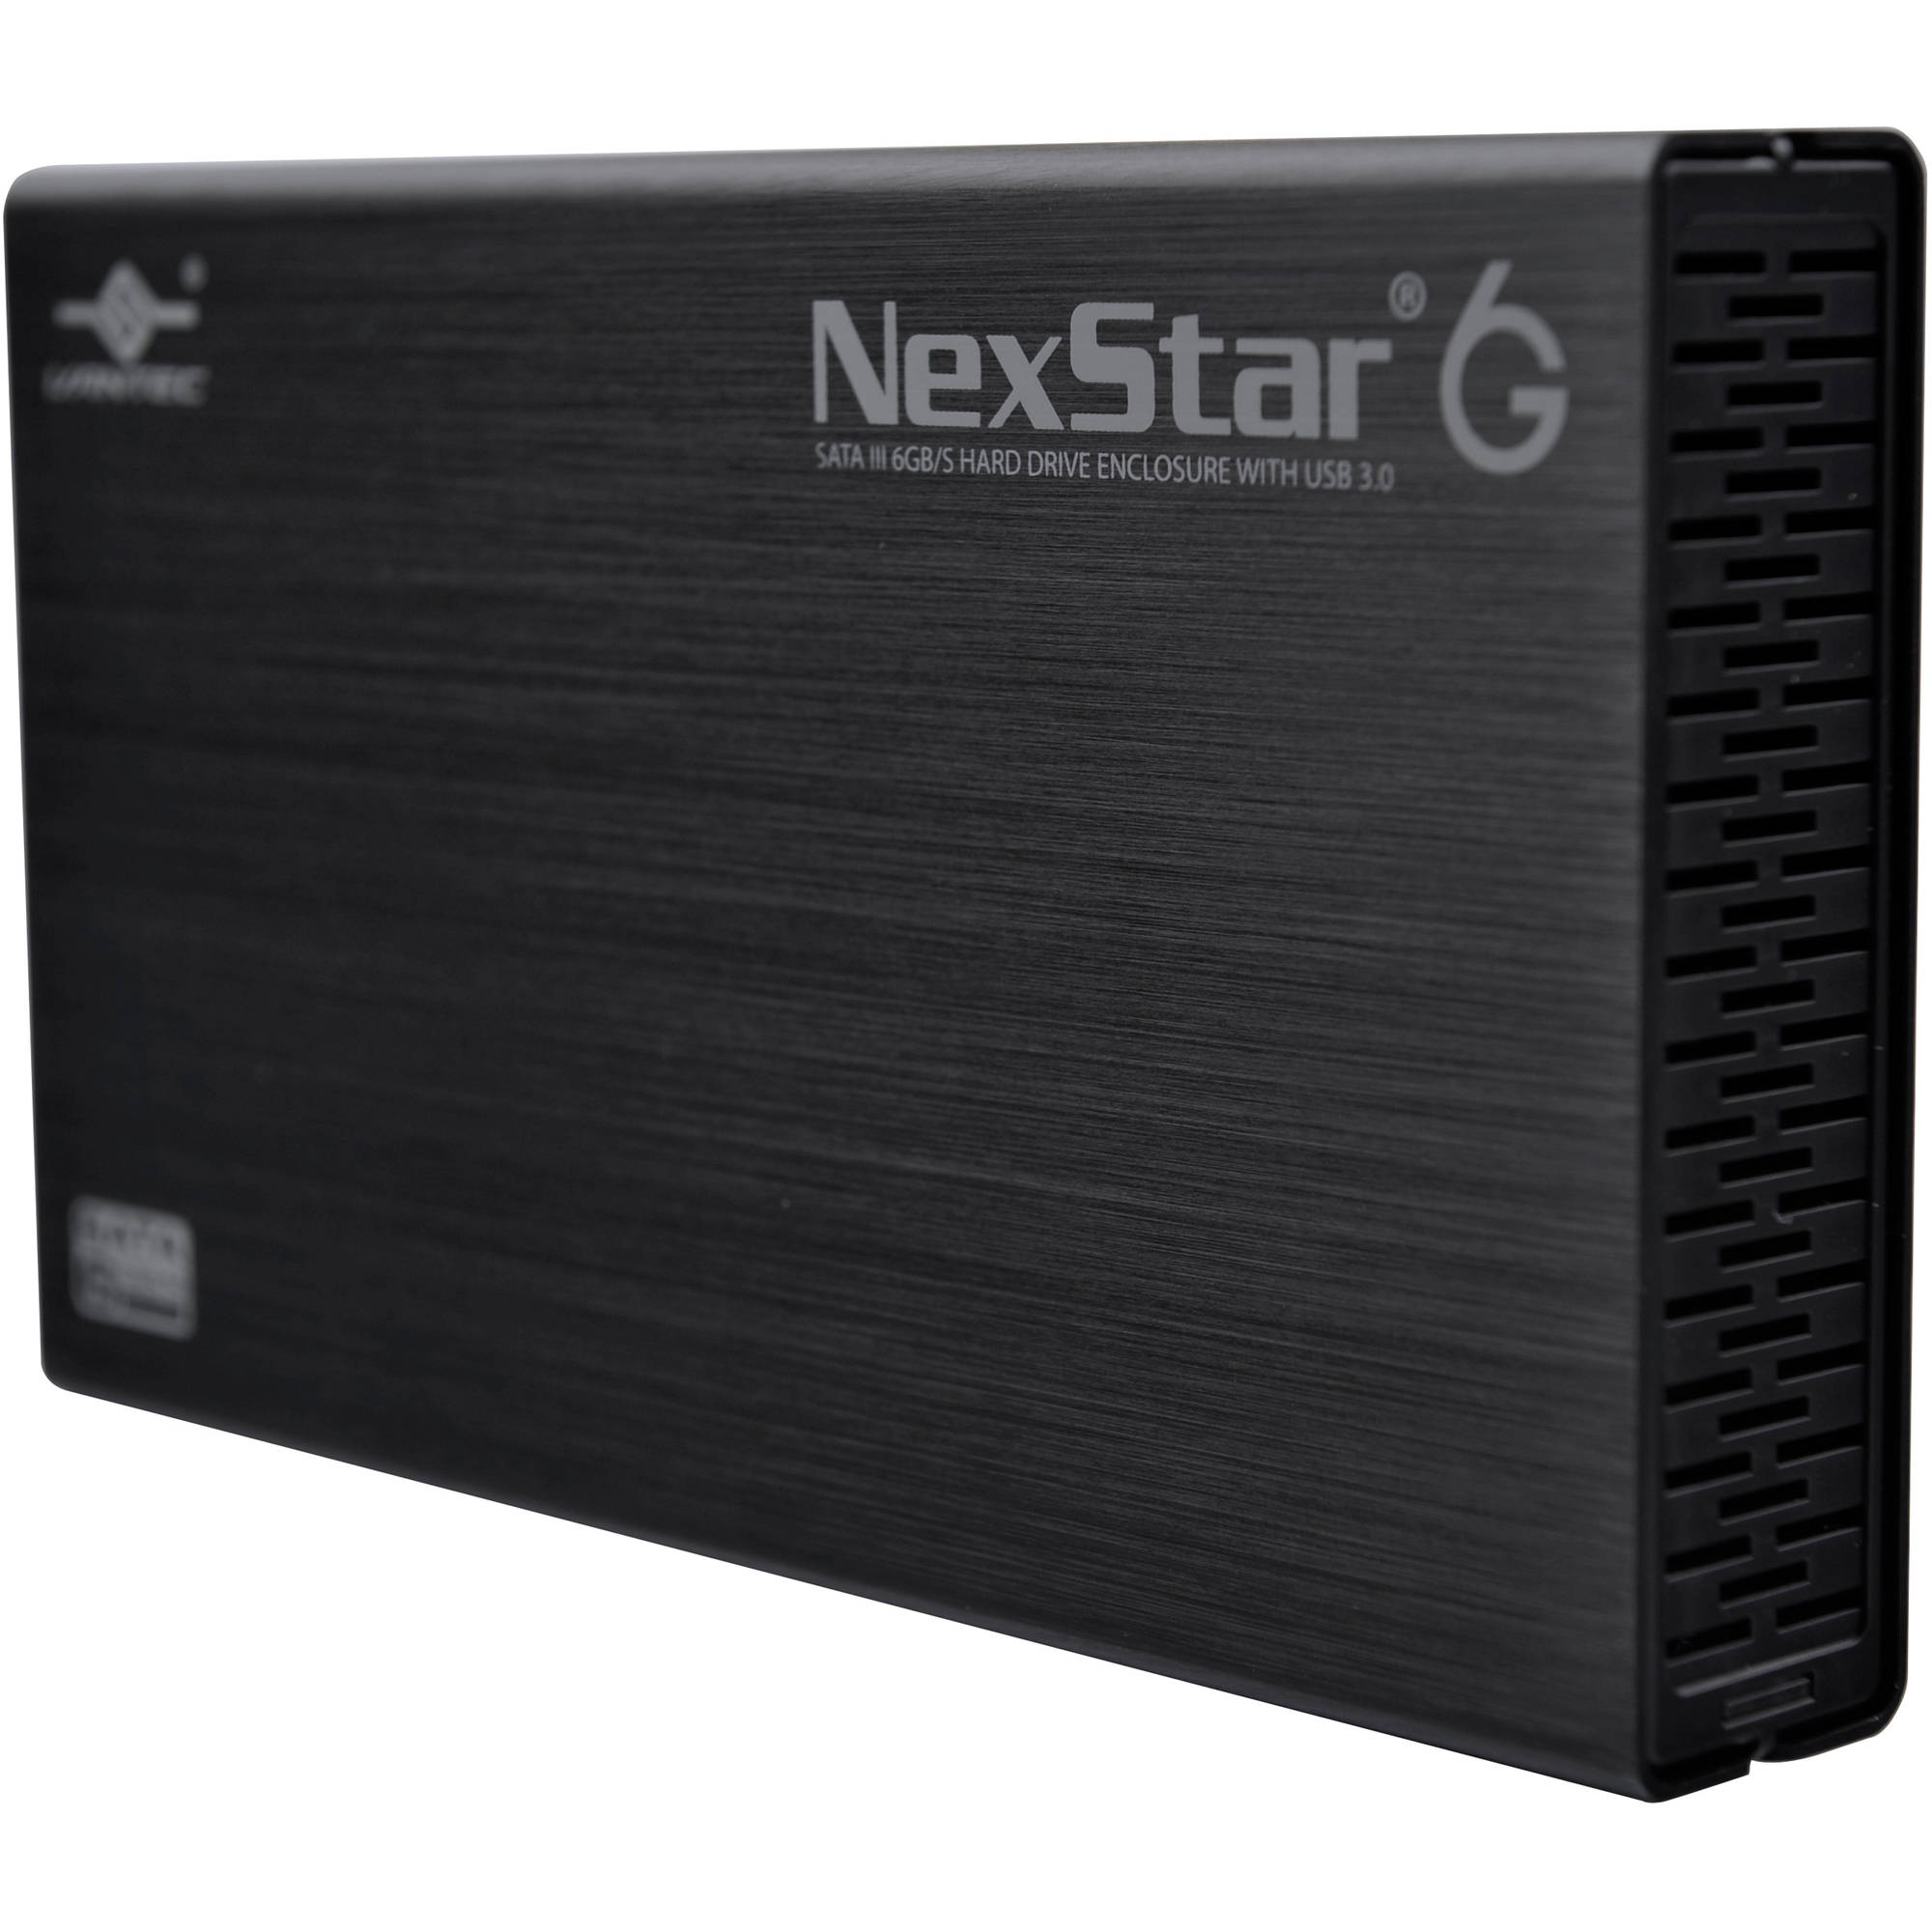 "Vantec NST-366S3-BK 3.5"" SATA 6Gbps to USB 3.0 HDD Enclosure, Black"